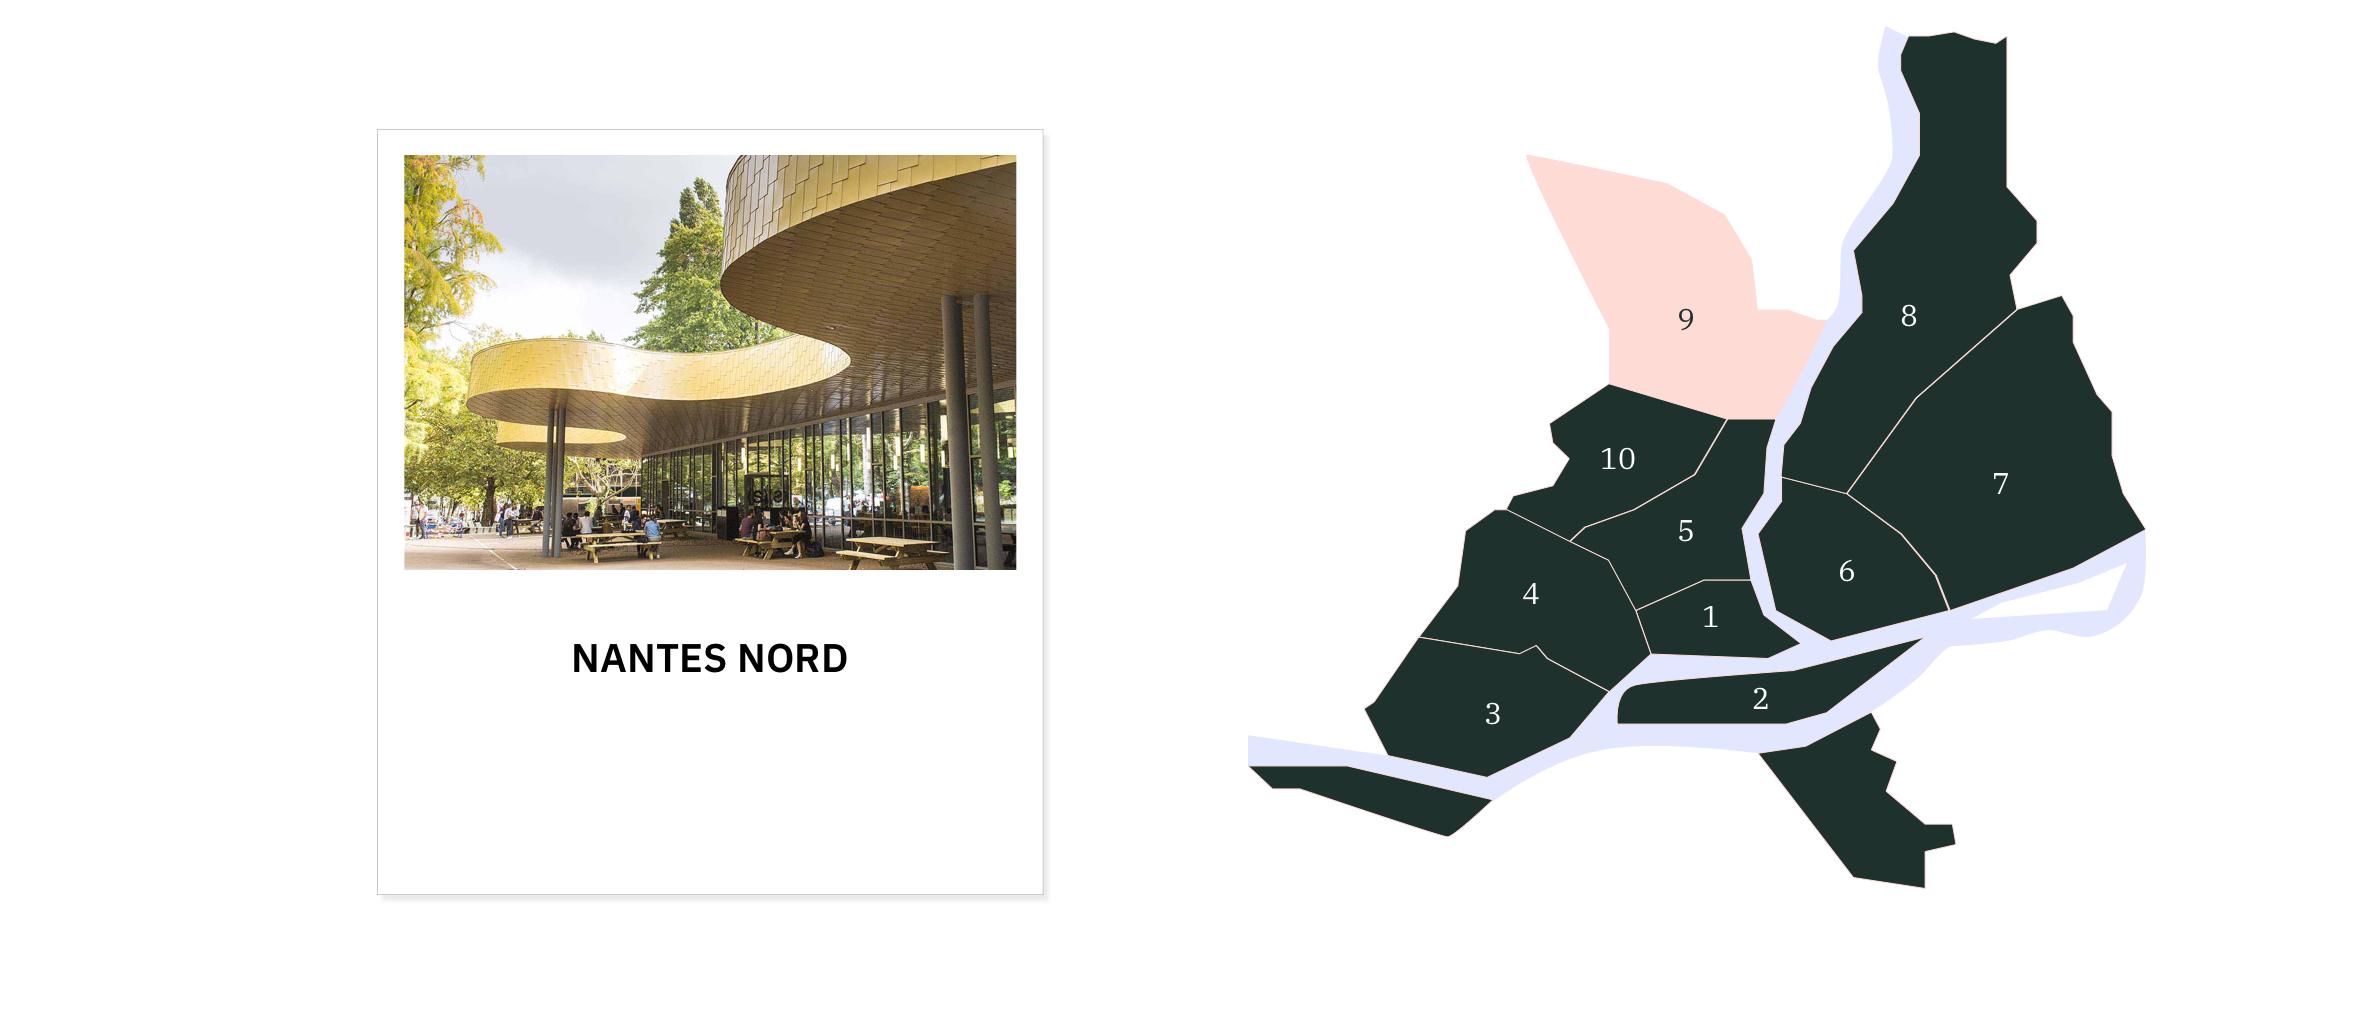 Nantes Nord ⎜Carte des quartiers de Nantes